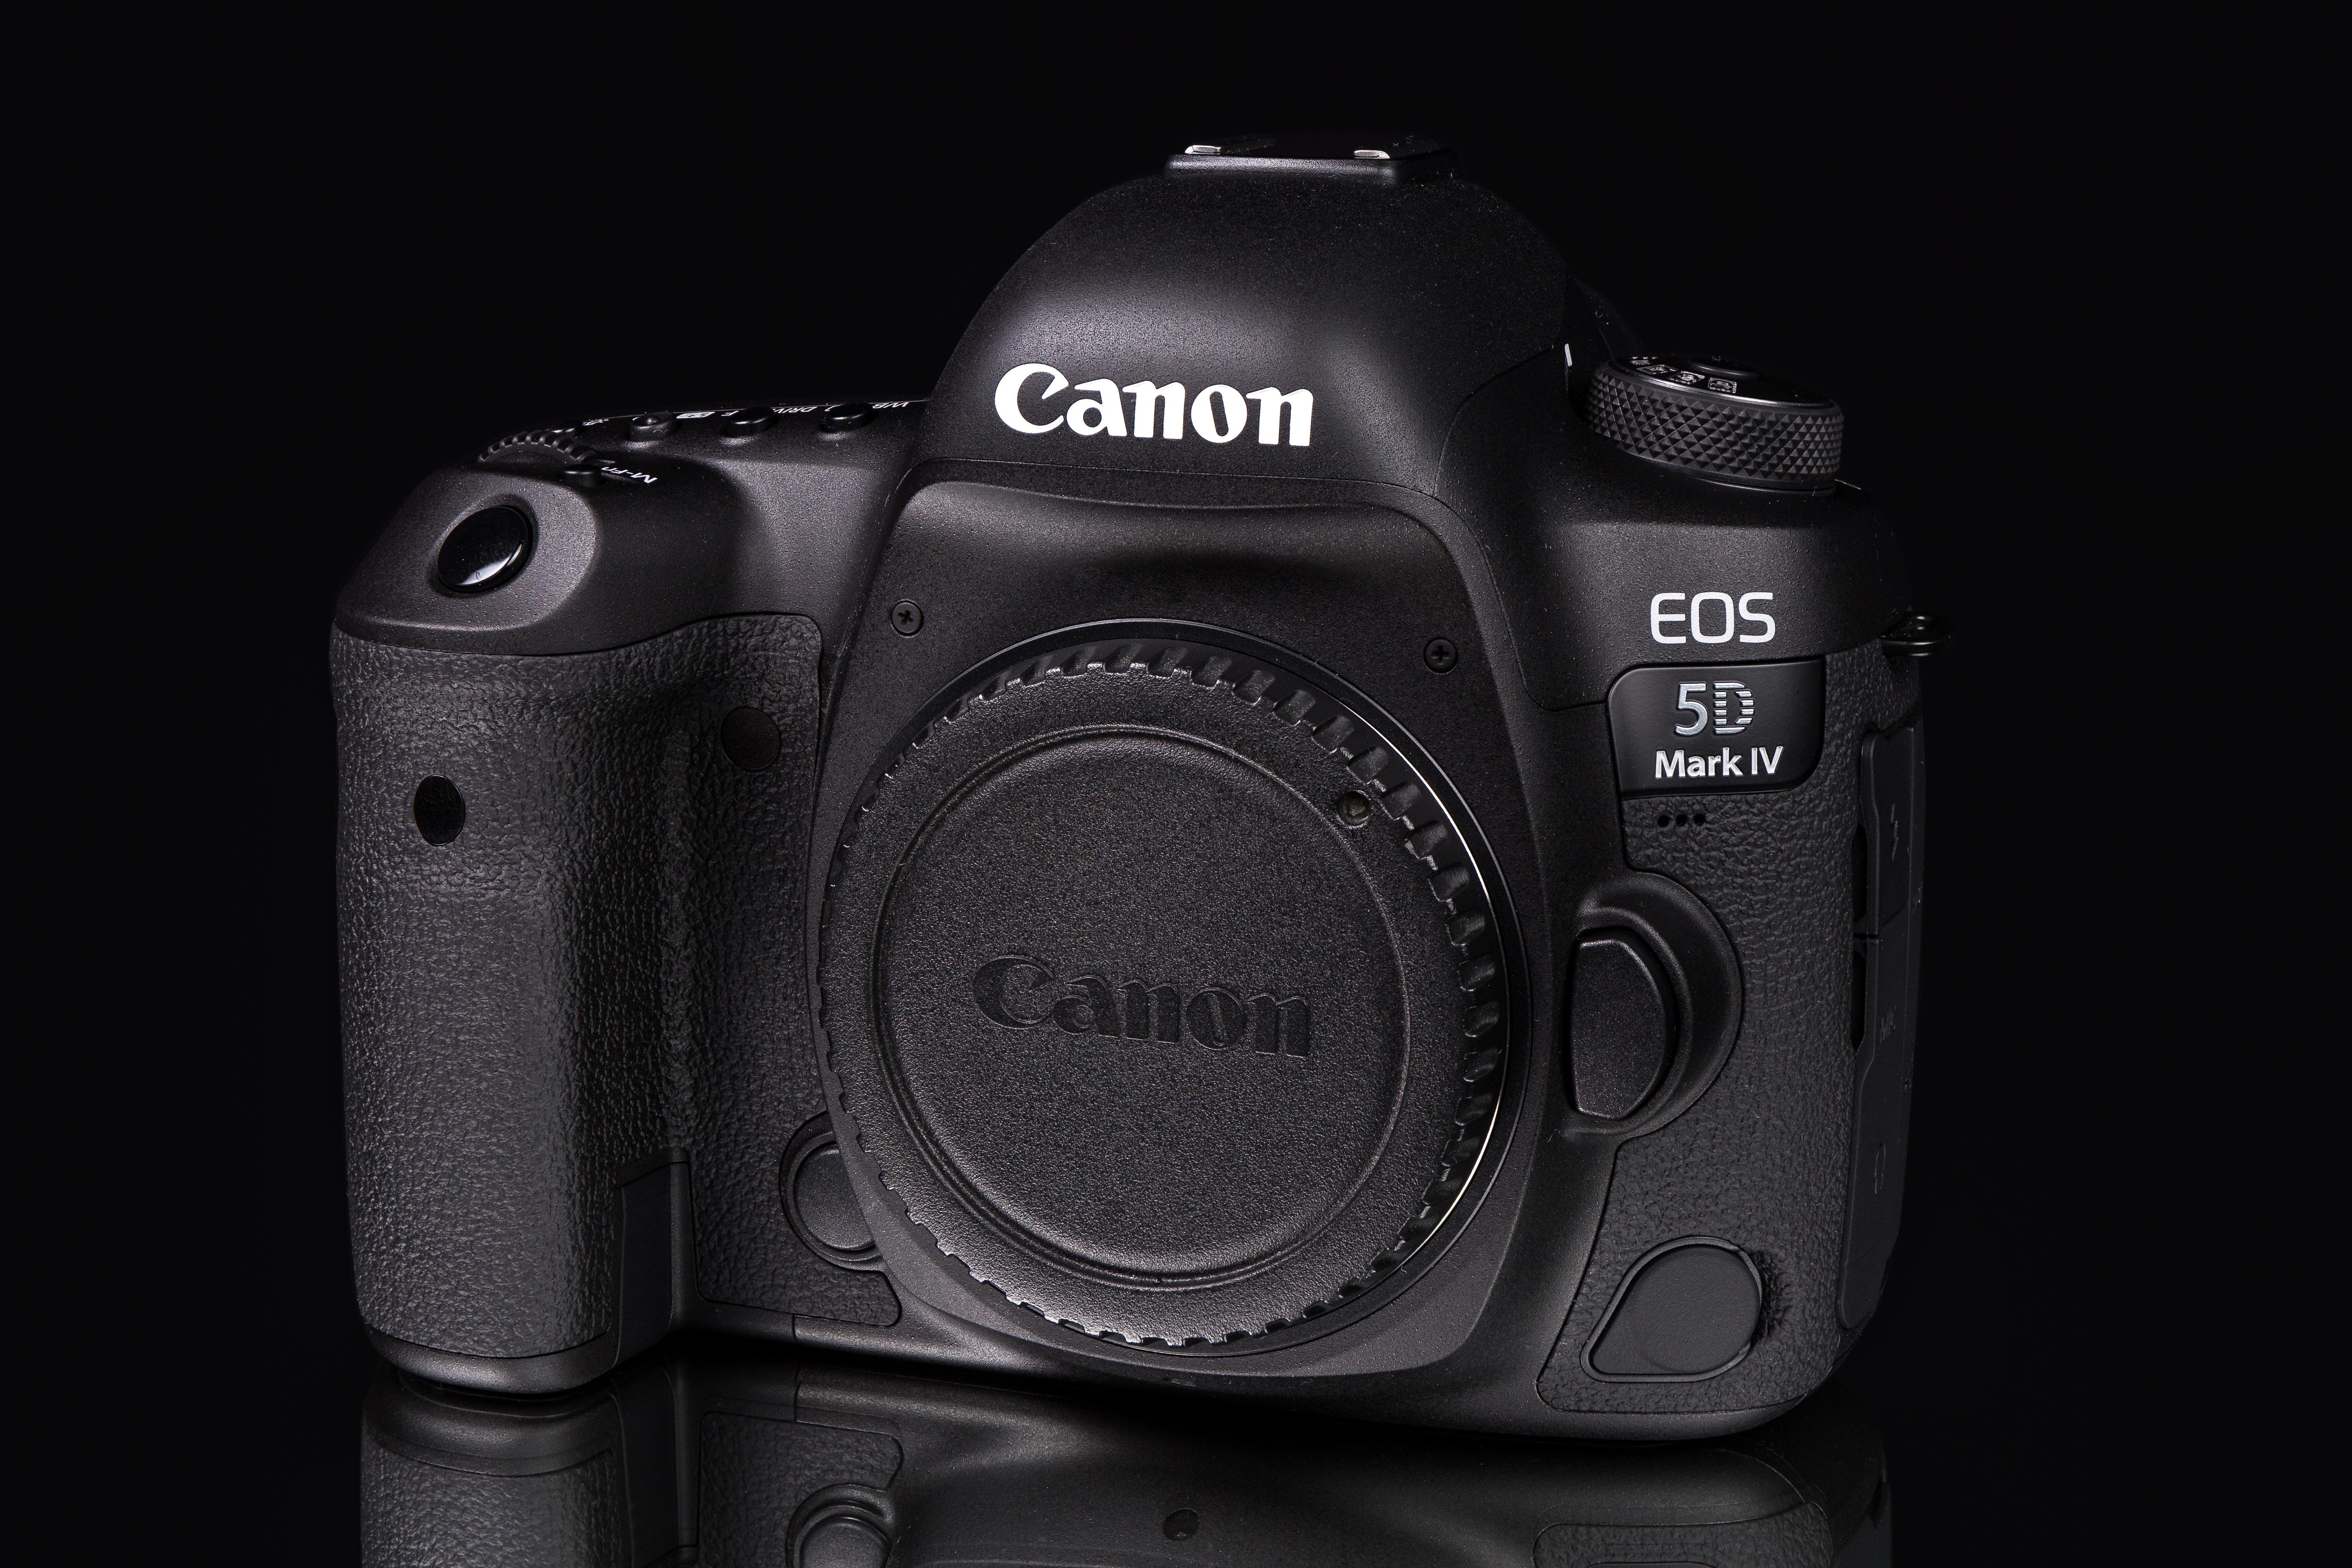 Filecanon Eos 5d Mark Iv Front 1803241116 Ako Wikimedia Canon Body Only Camera Dslr 4